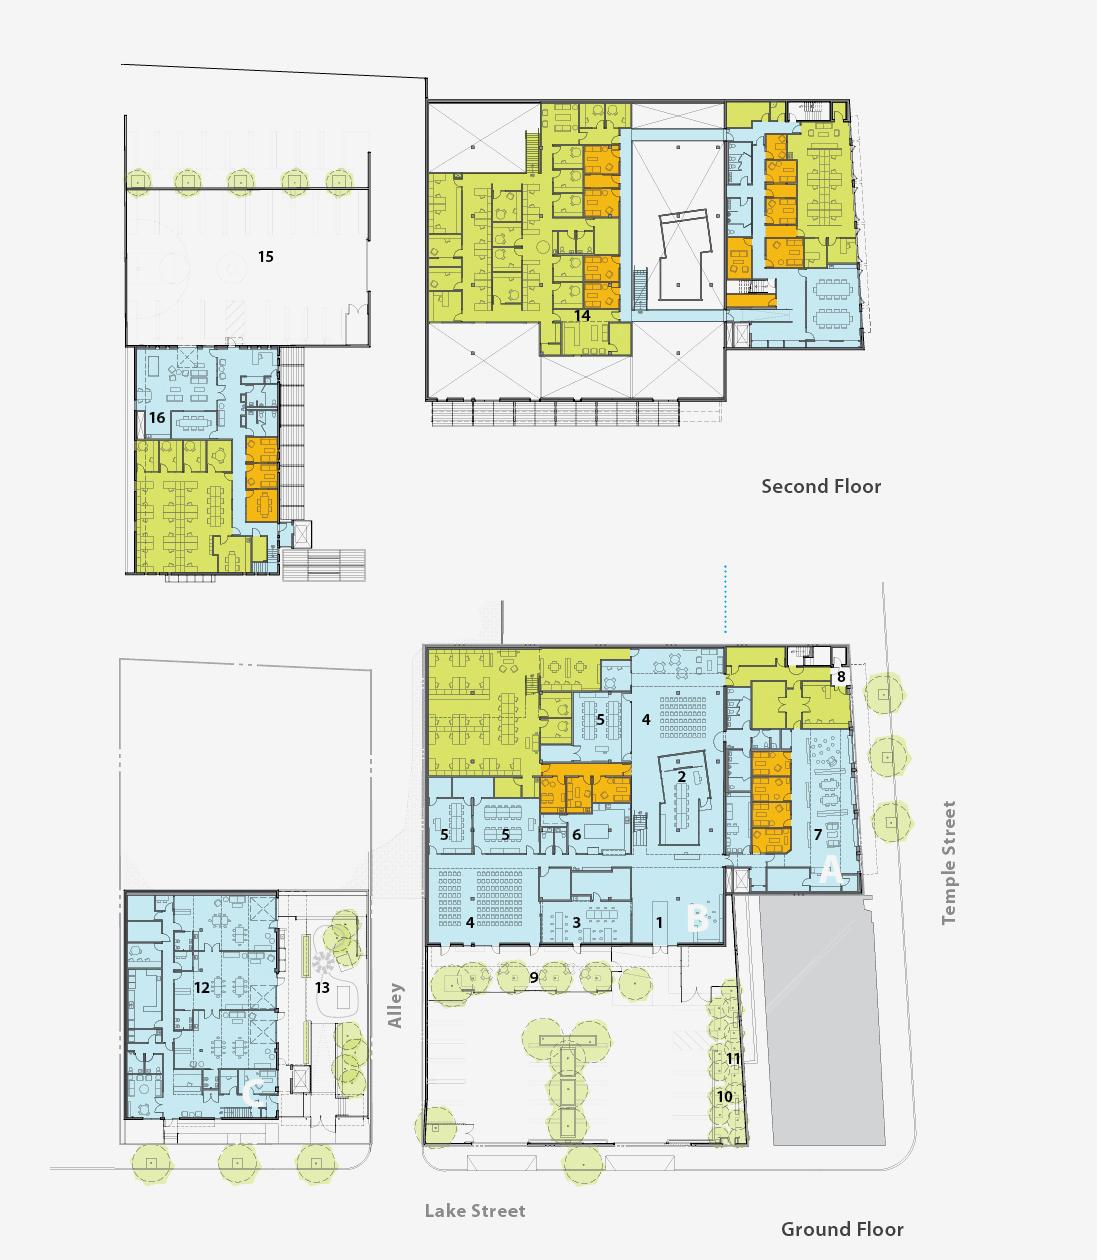 Otis Booth Campus - Plans - KEA.jpg